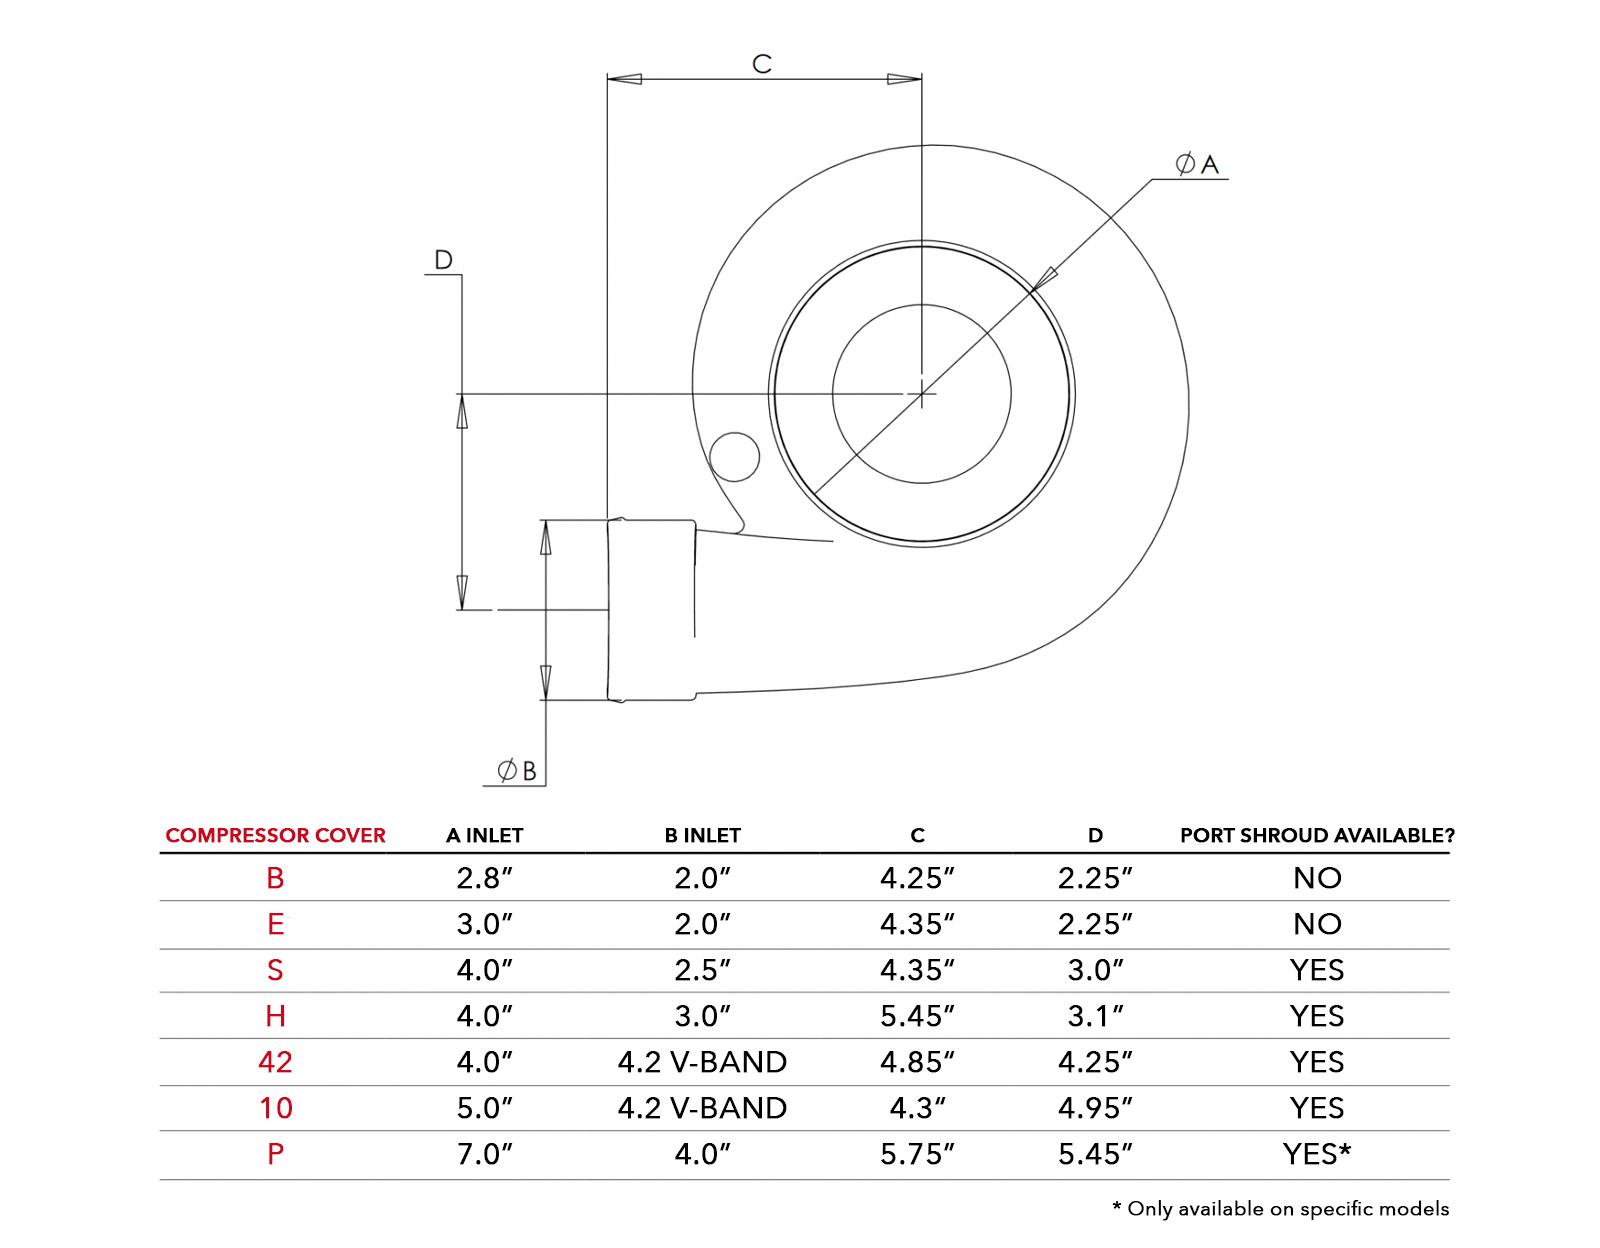 PTE Turbo Compressor Cover Options